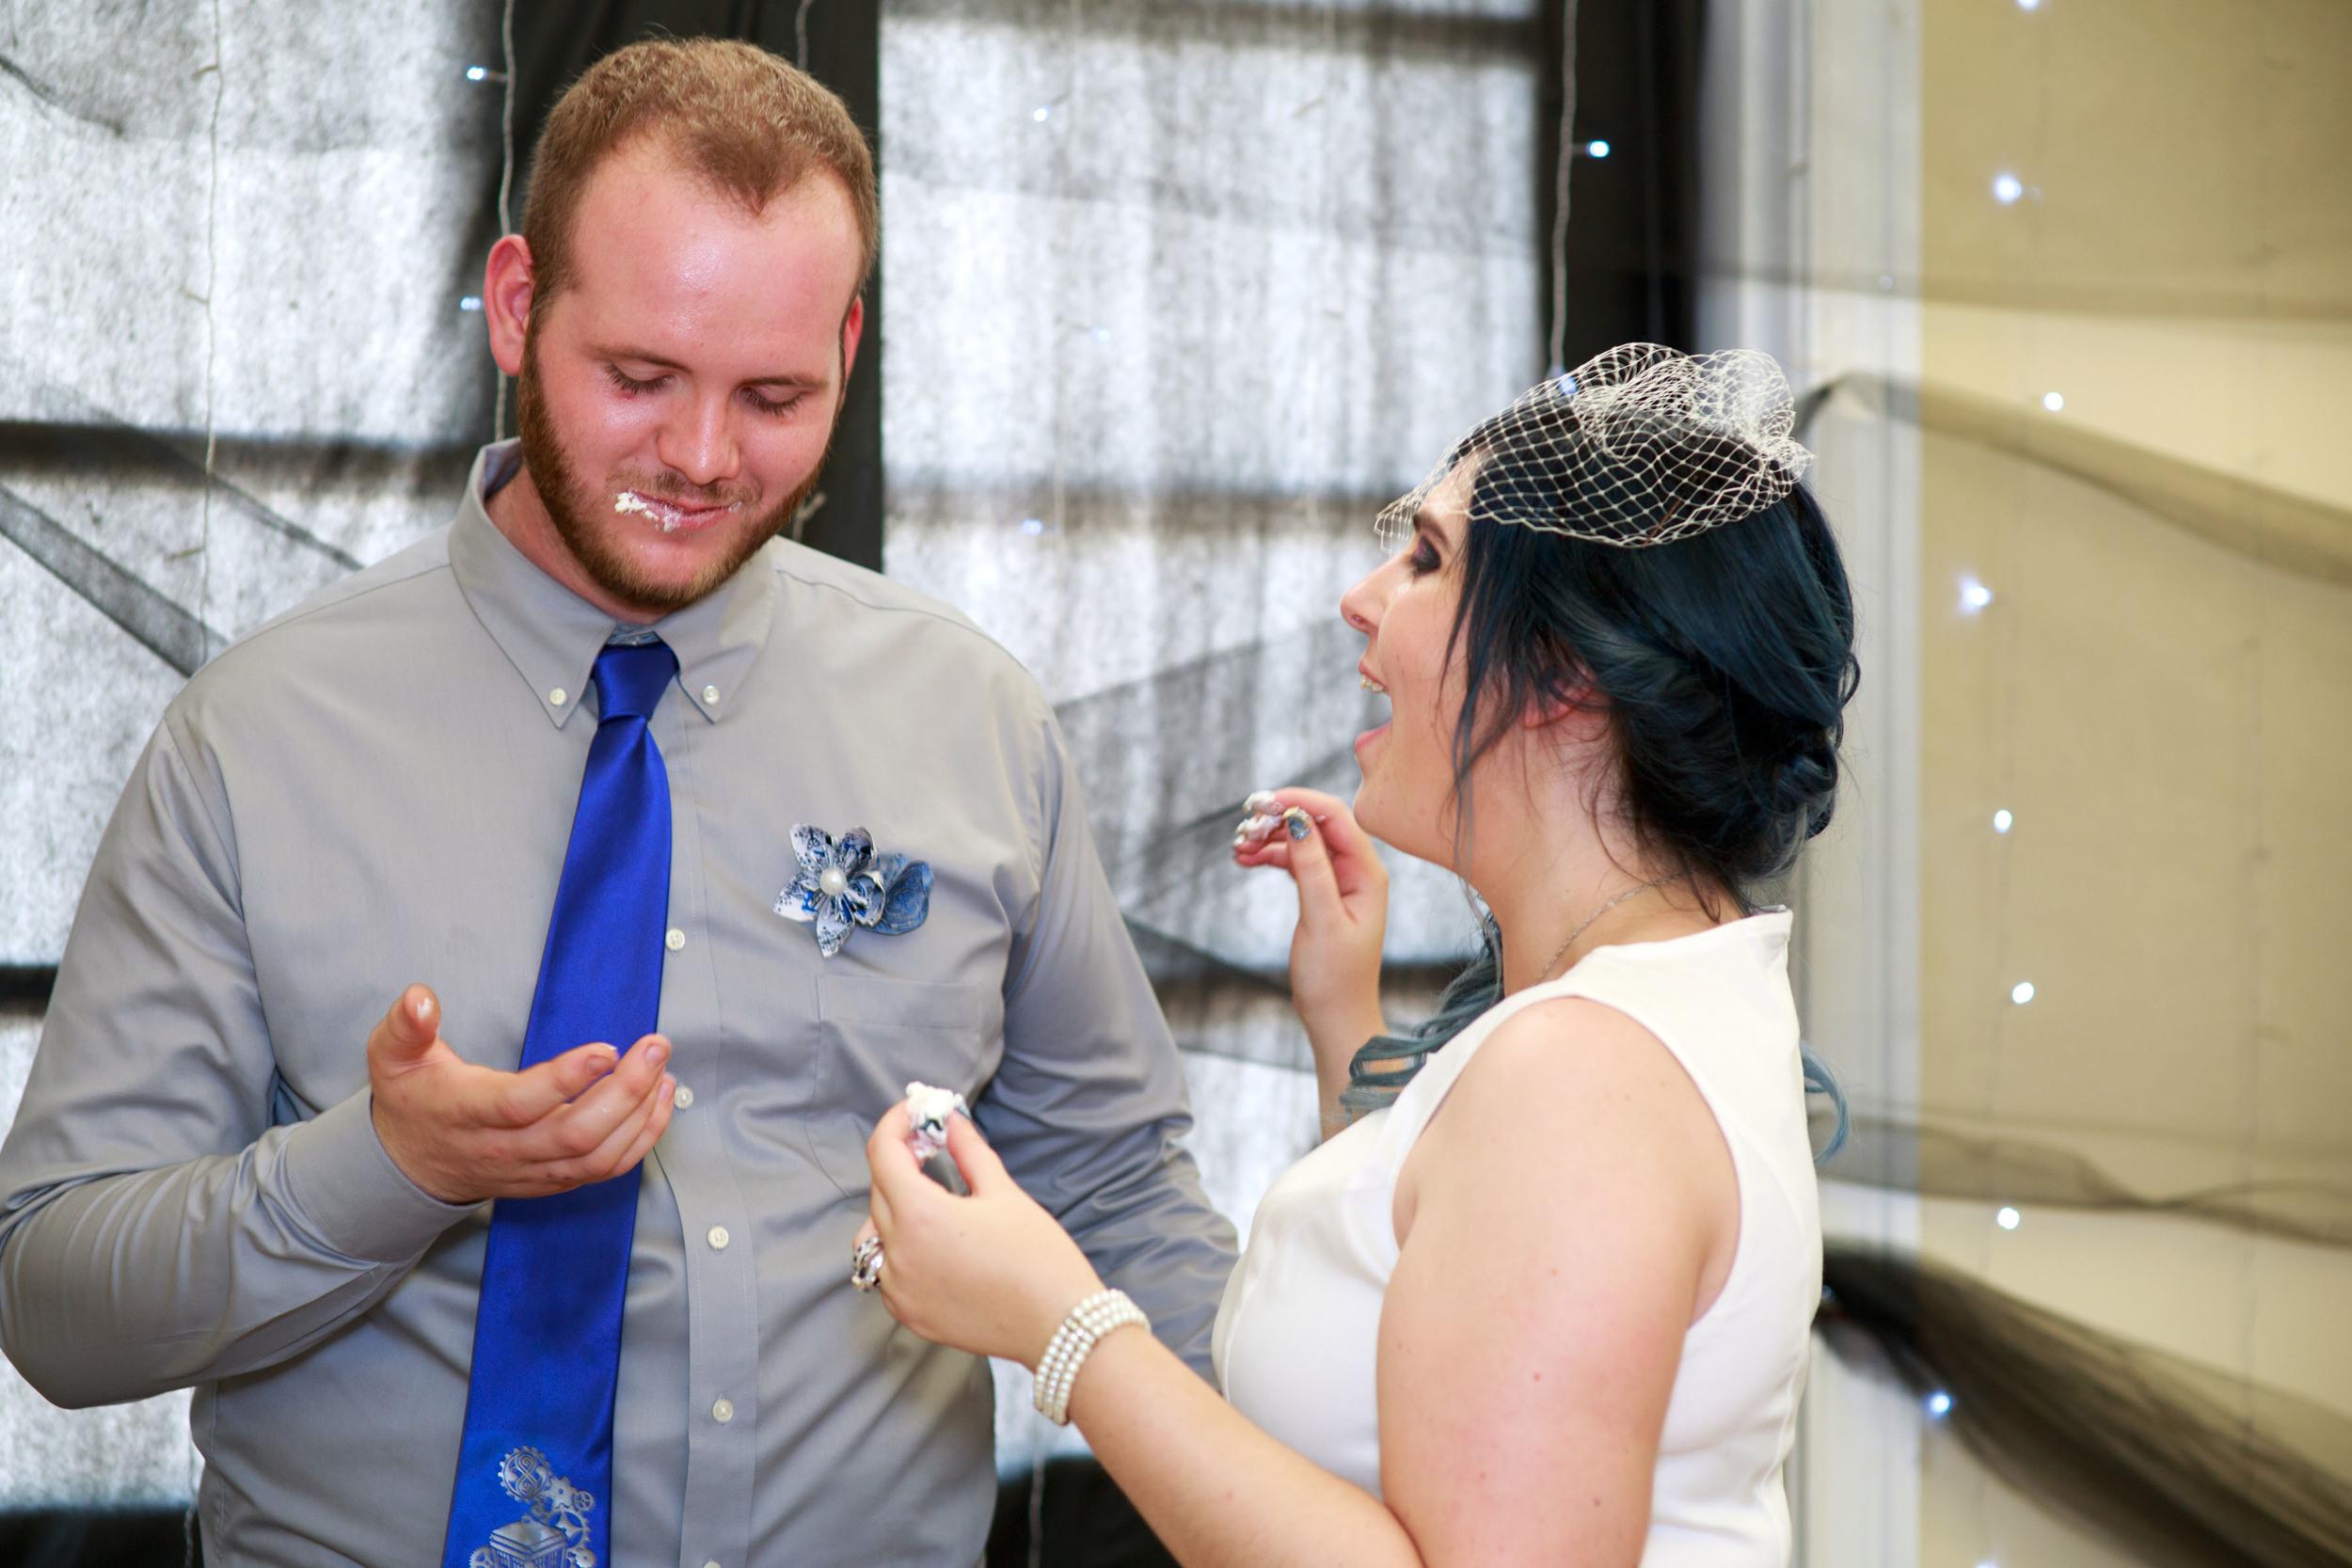 Leland_Wedding_Photographer_Tiffany_Abruzzo_Reception_46.jpg